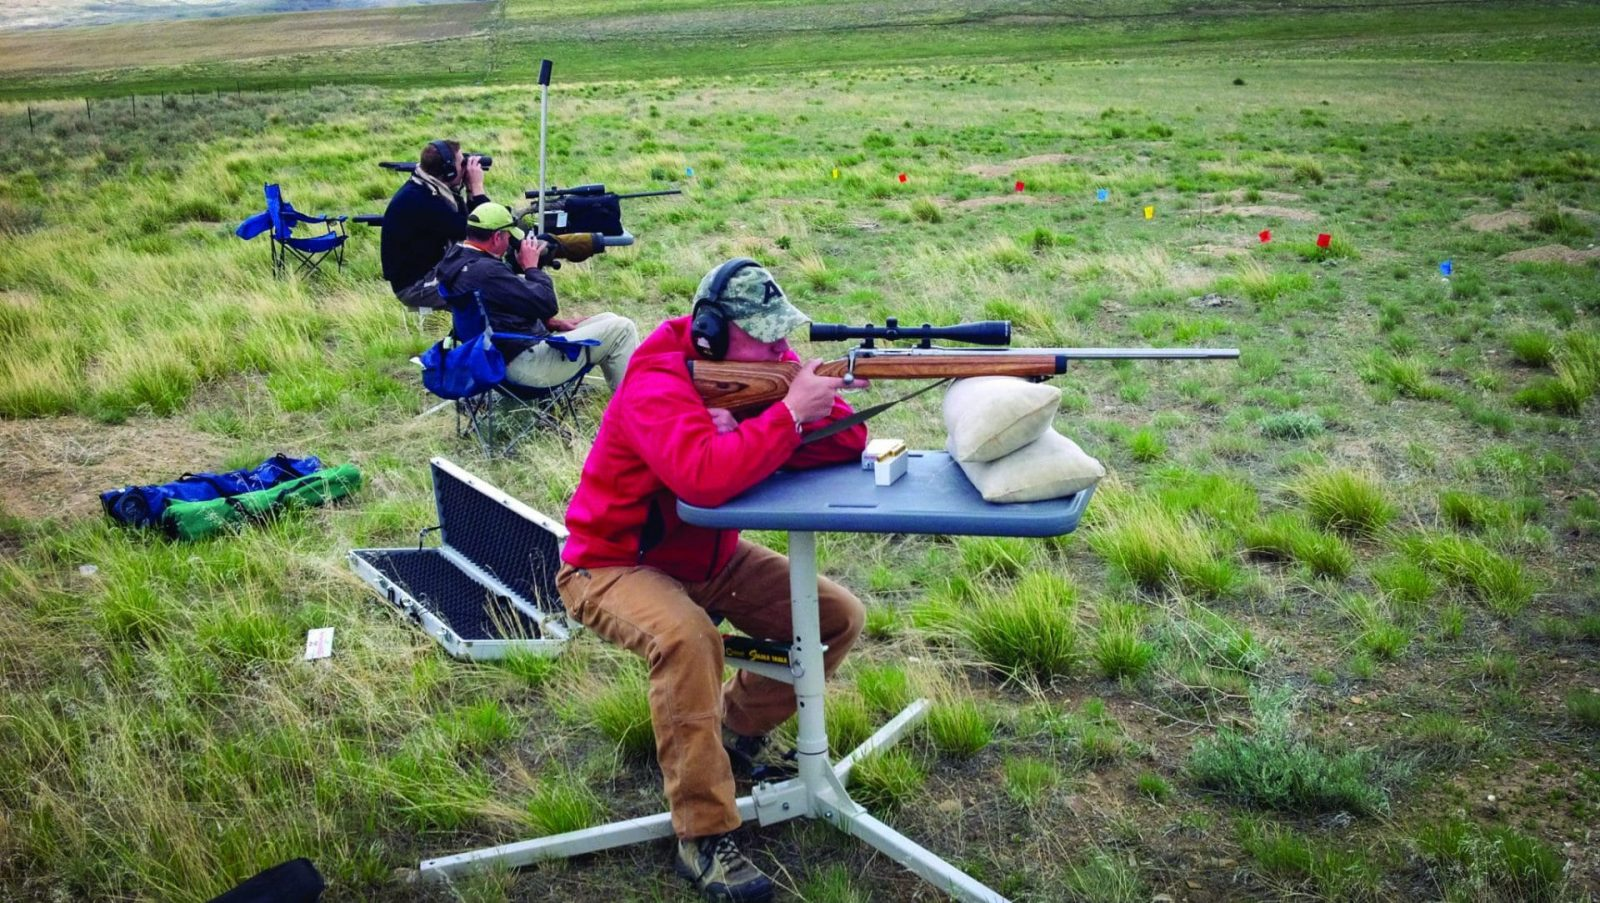 hunting prairie dogs, prairie dog hunting videos, prairie dog hunting guns